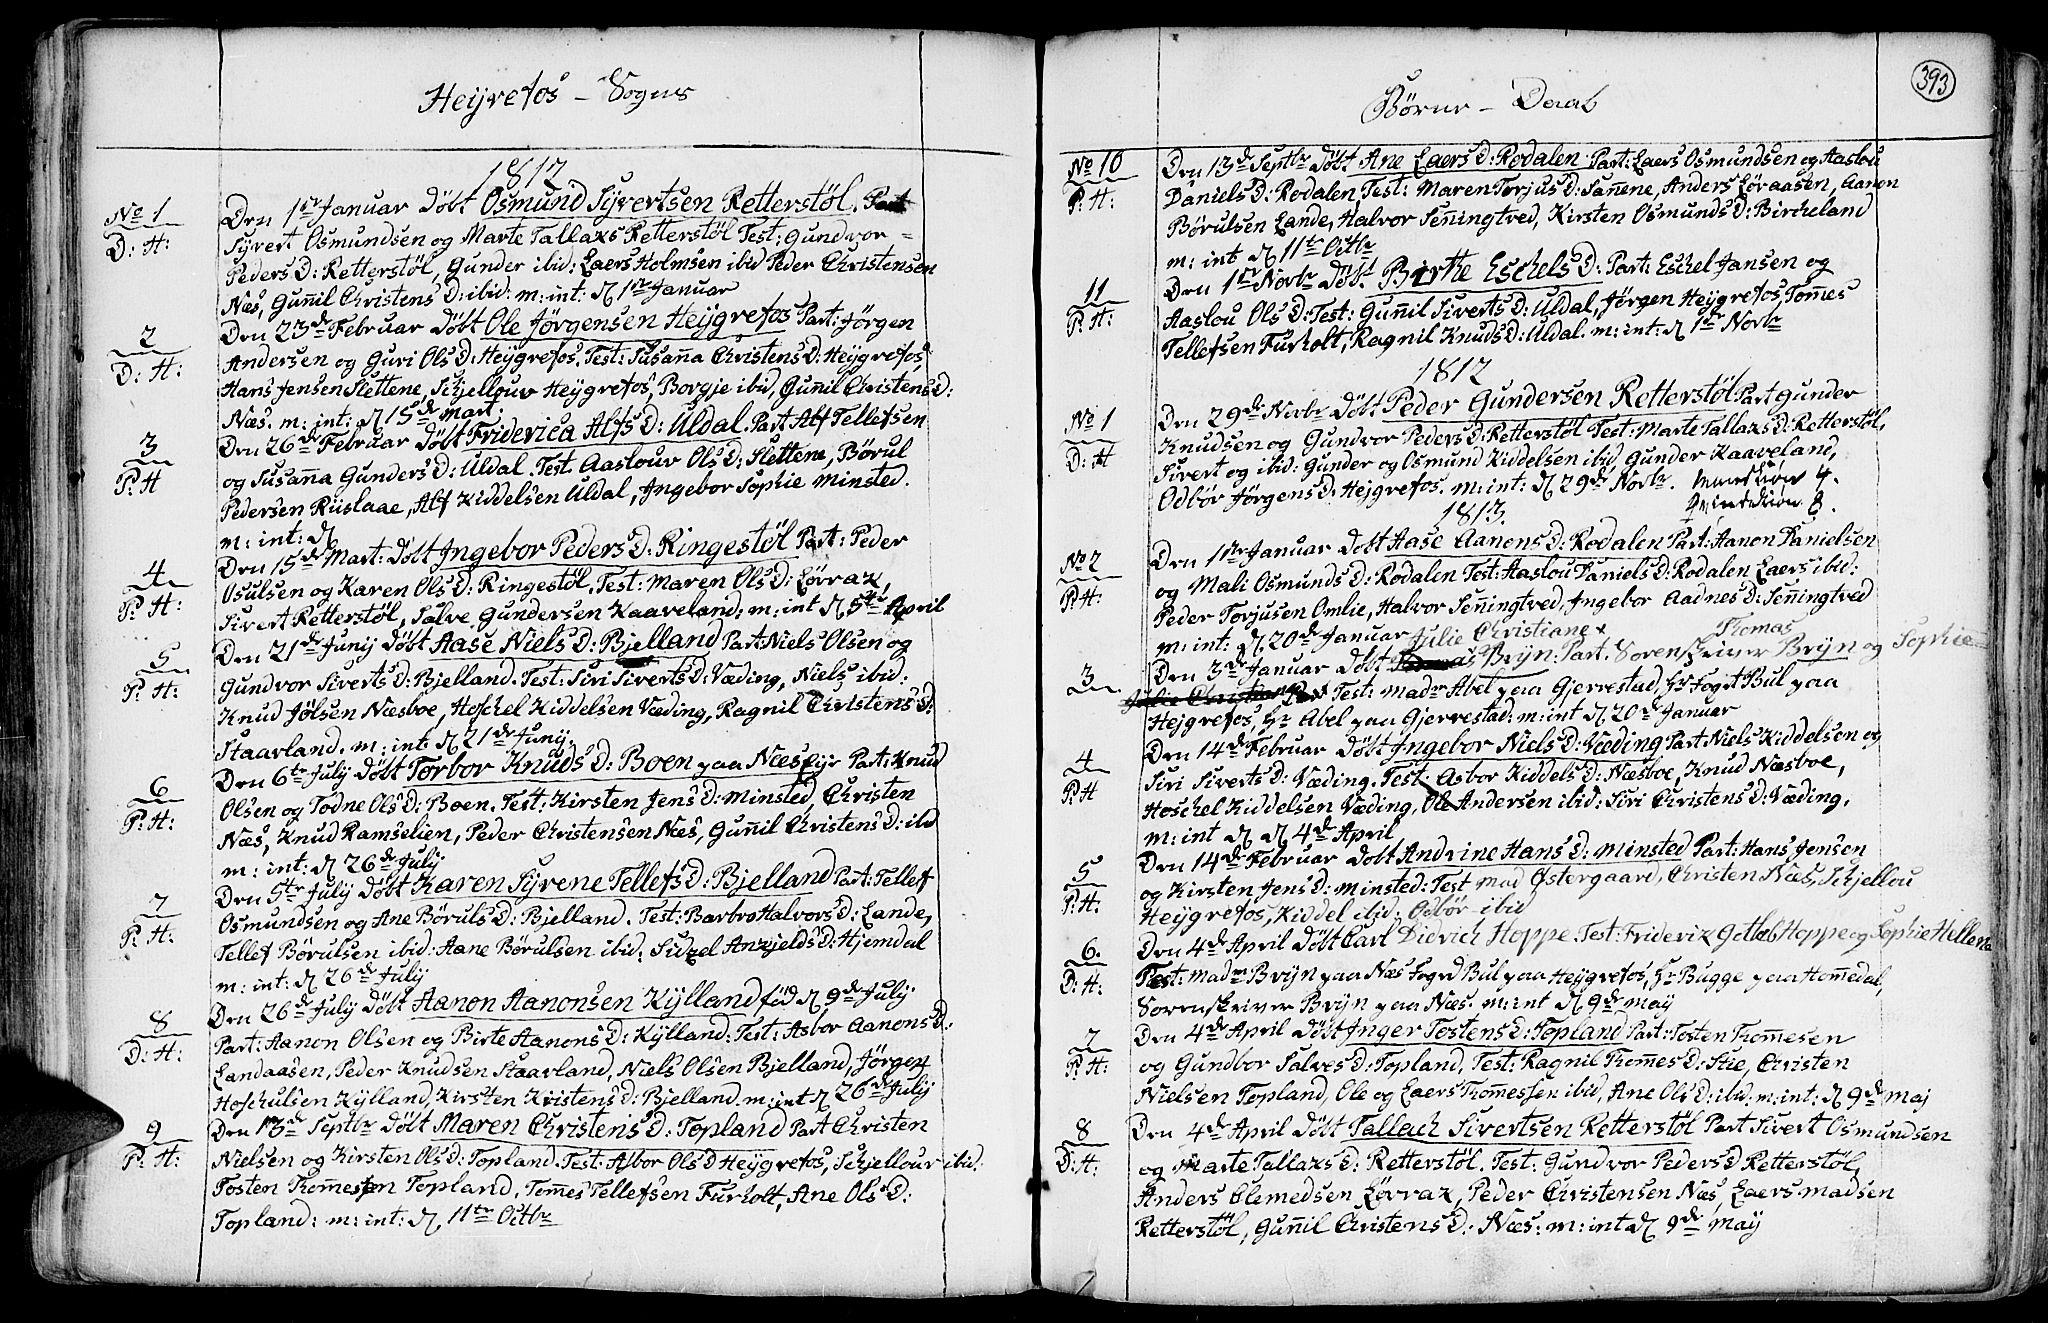 SAK, Hommedal sokneprestkontor, F/Fa/Fab/L0002: Ministerialbok nr. A 2 /3, 1740-1821, s. 393